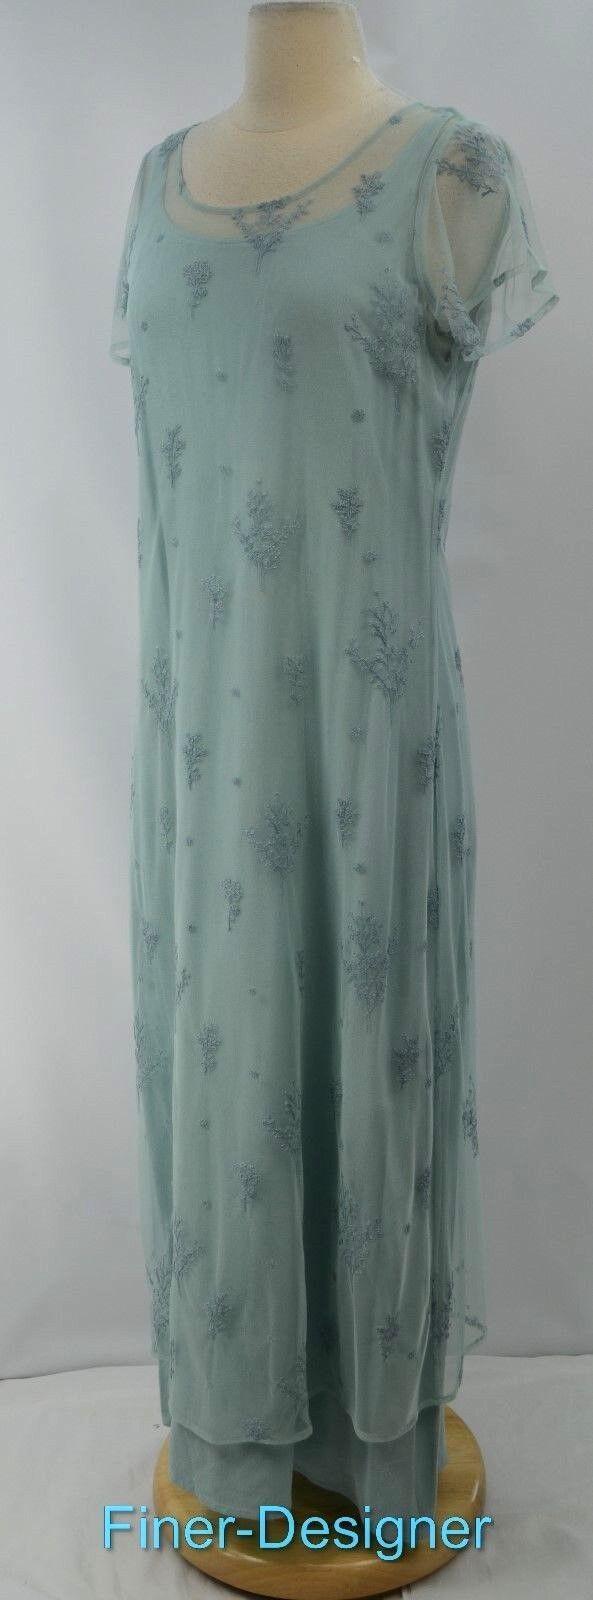 J J. Jill long 2pc mesh illusion maxi Dress Peasant embroidered sheath SZ S NEW